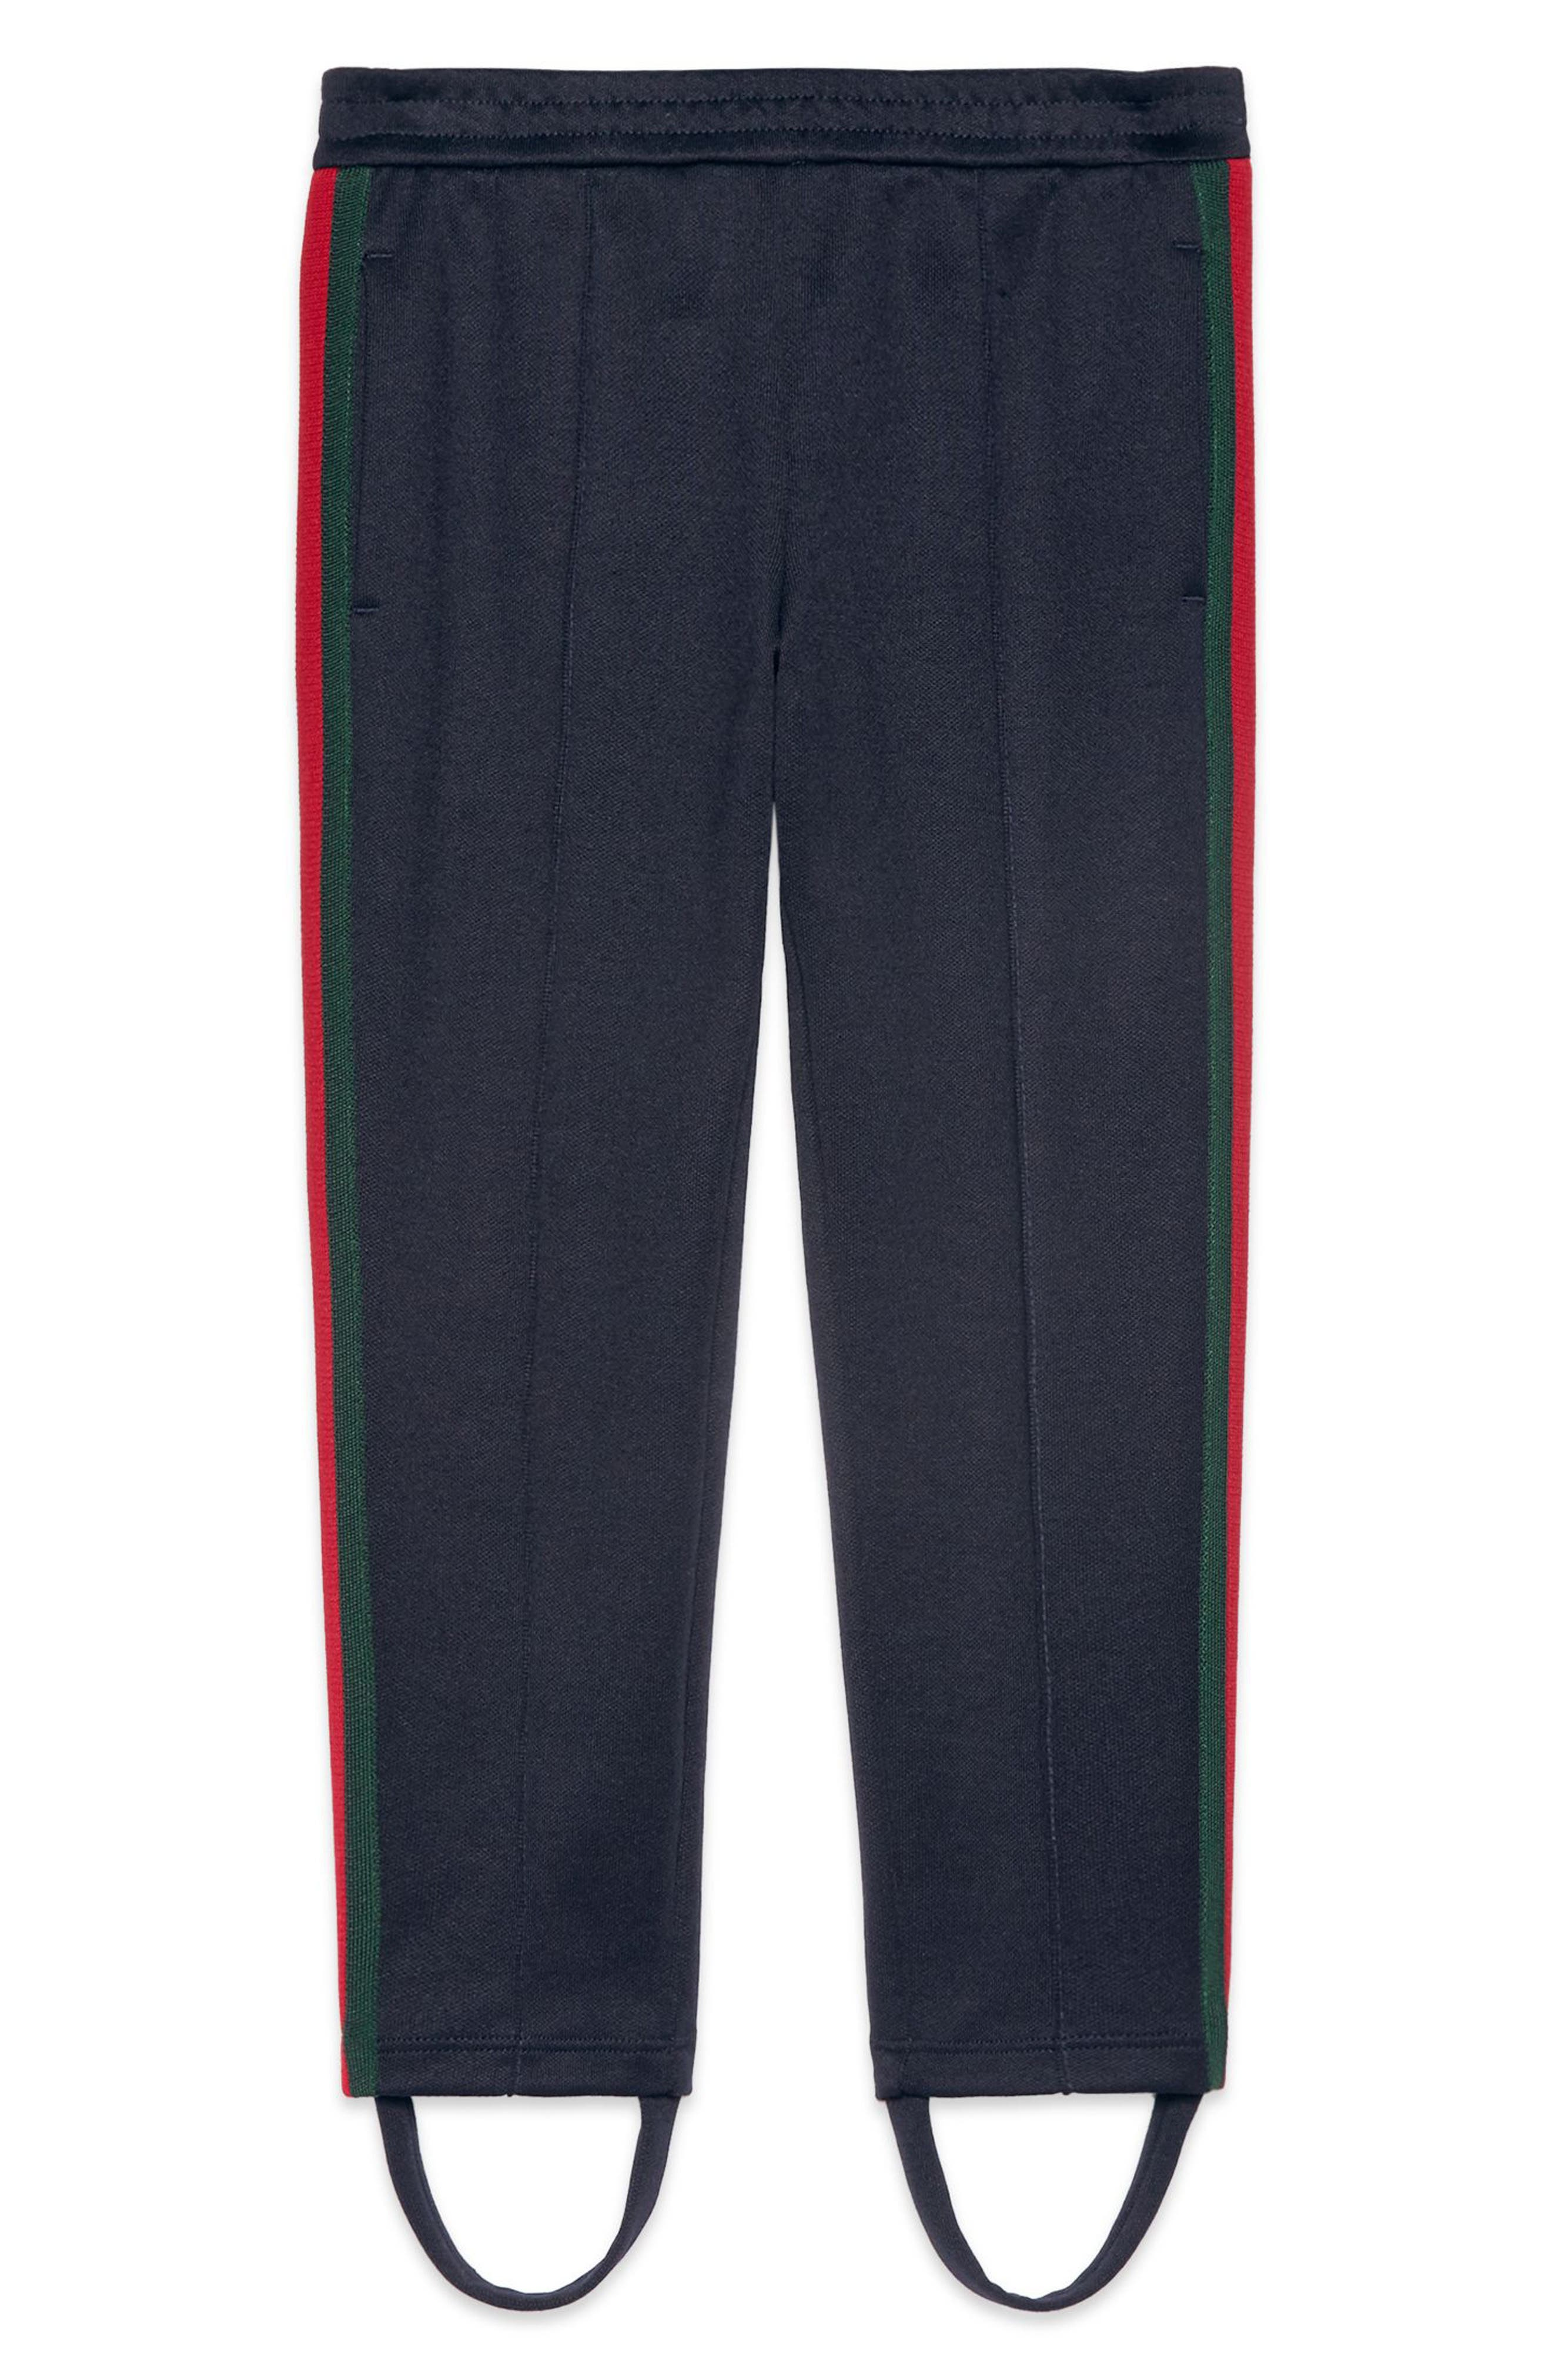 Gucci Stripe Jersey Stirrup Pants (Little Girls & Big Girls)